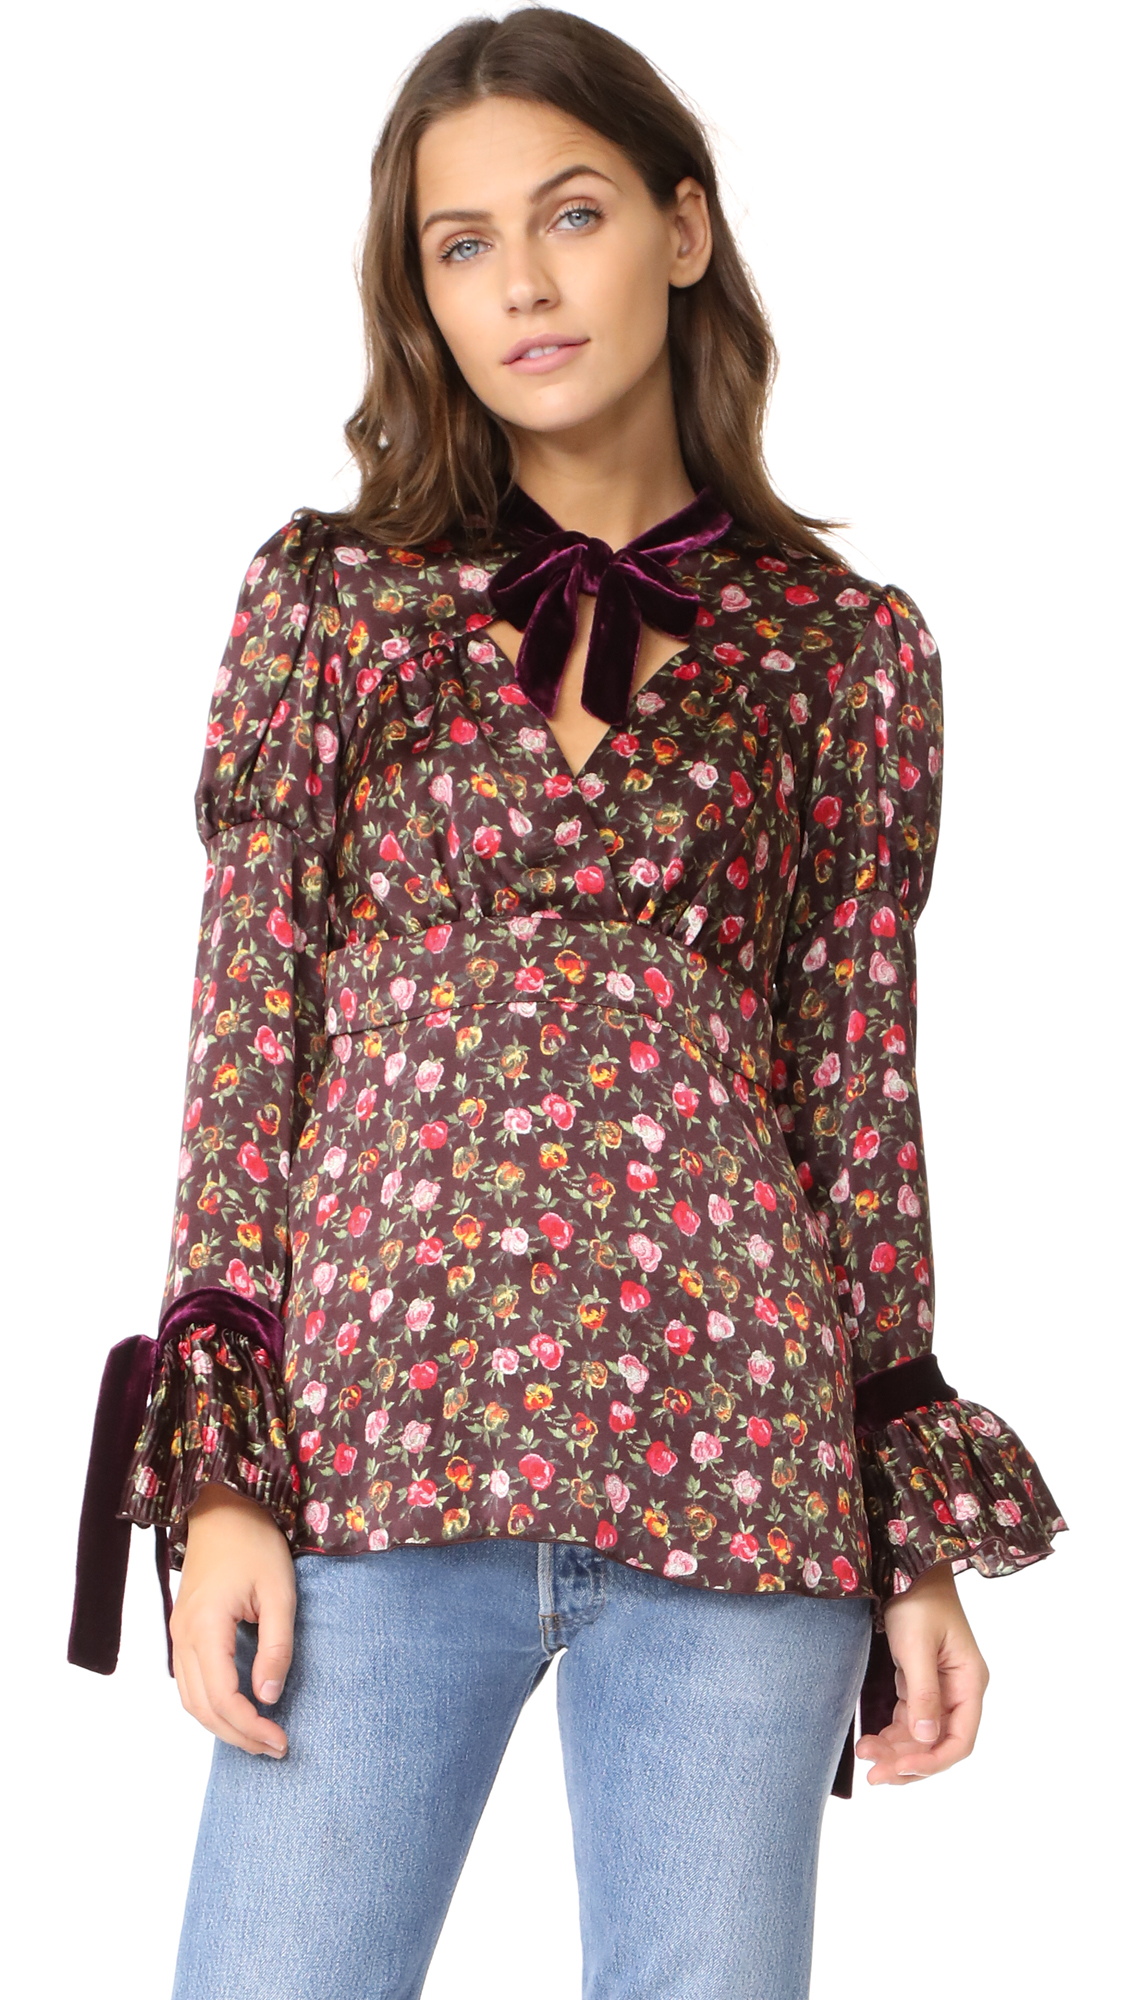 Anna Sui Rosebuds Charmeuse Blouse - Fern Multi